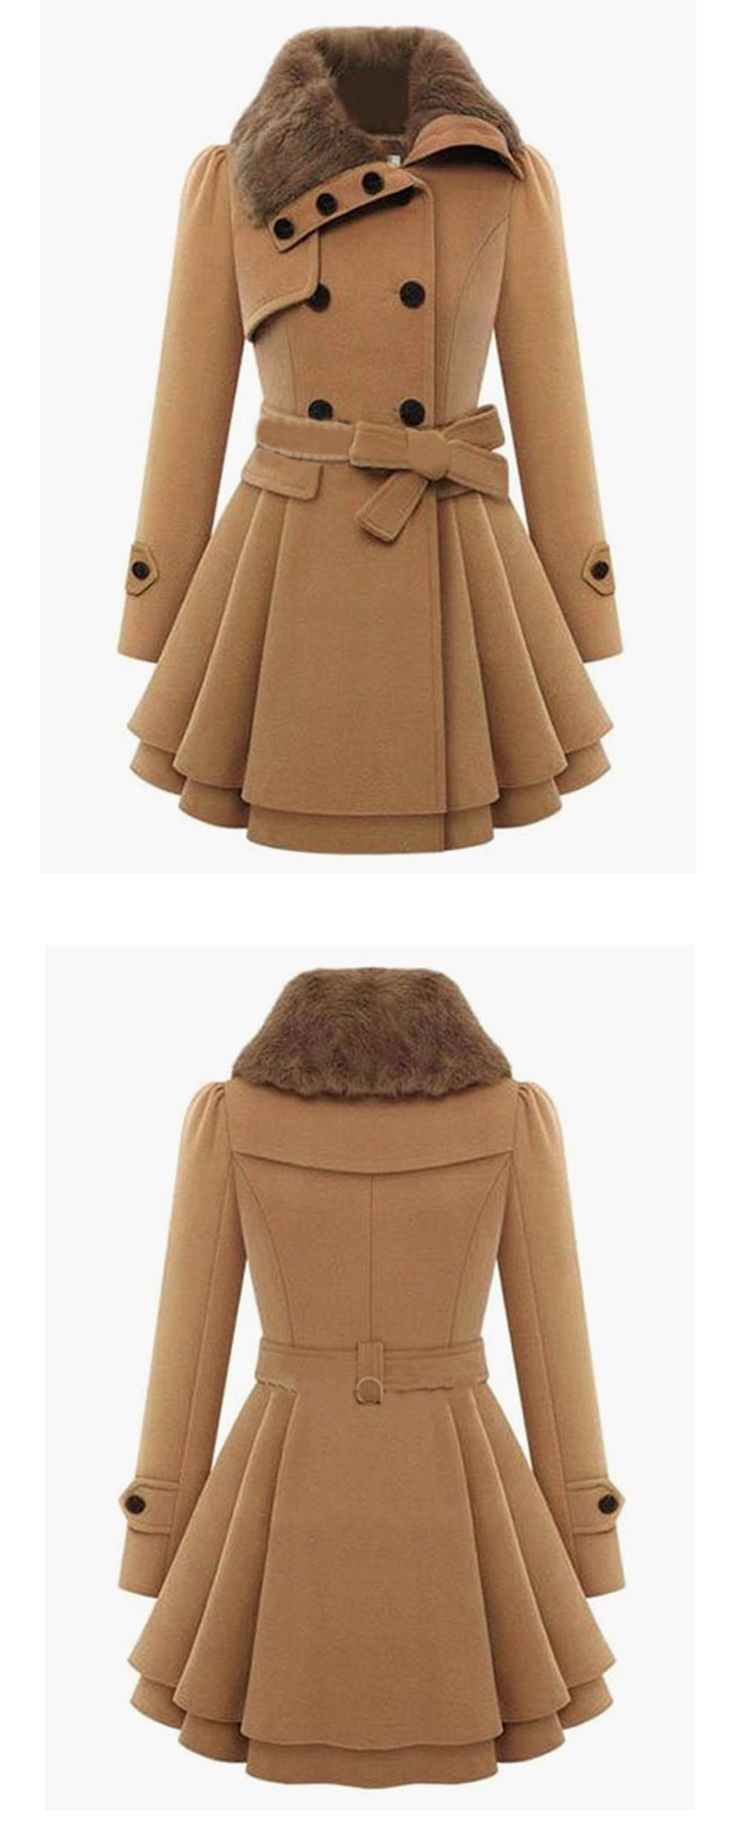 Khaki Long Sleeve Double Breasted Tie-Waist Coat - Winter Fashion - Street Fashion from SheIn.com